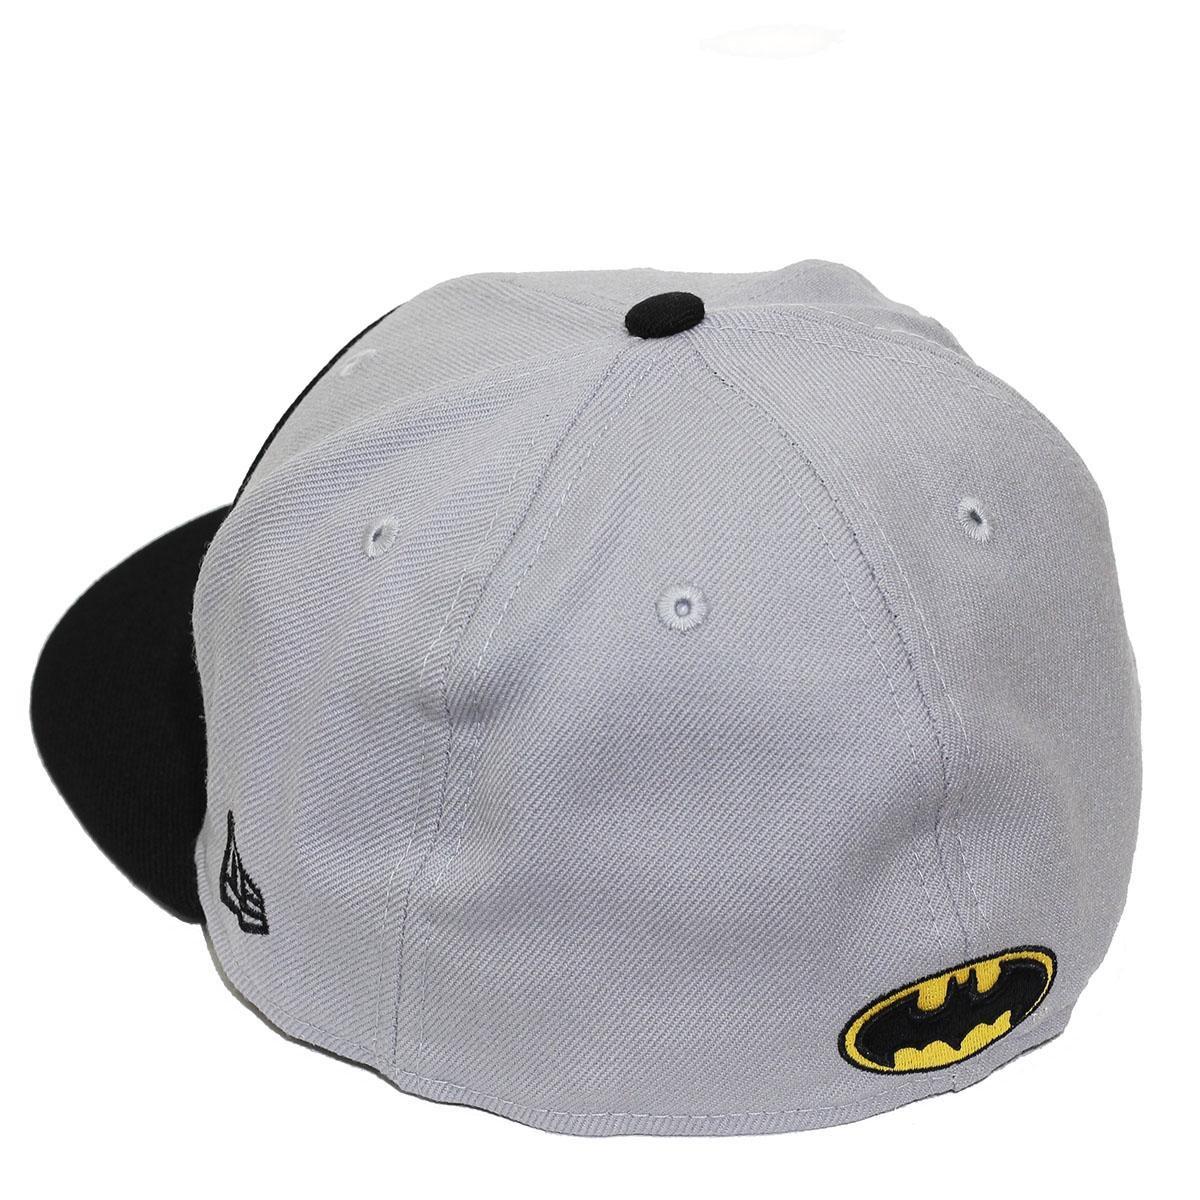 Boné New Era Aba Reta Fechado Batman Circle Plane - Cinza - Compre ... 78be15d40a5